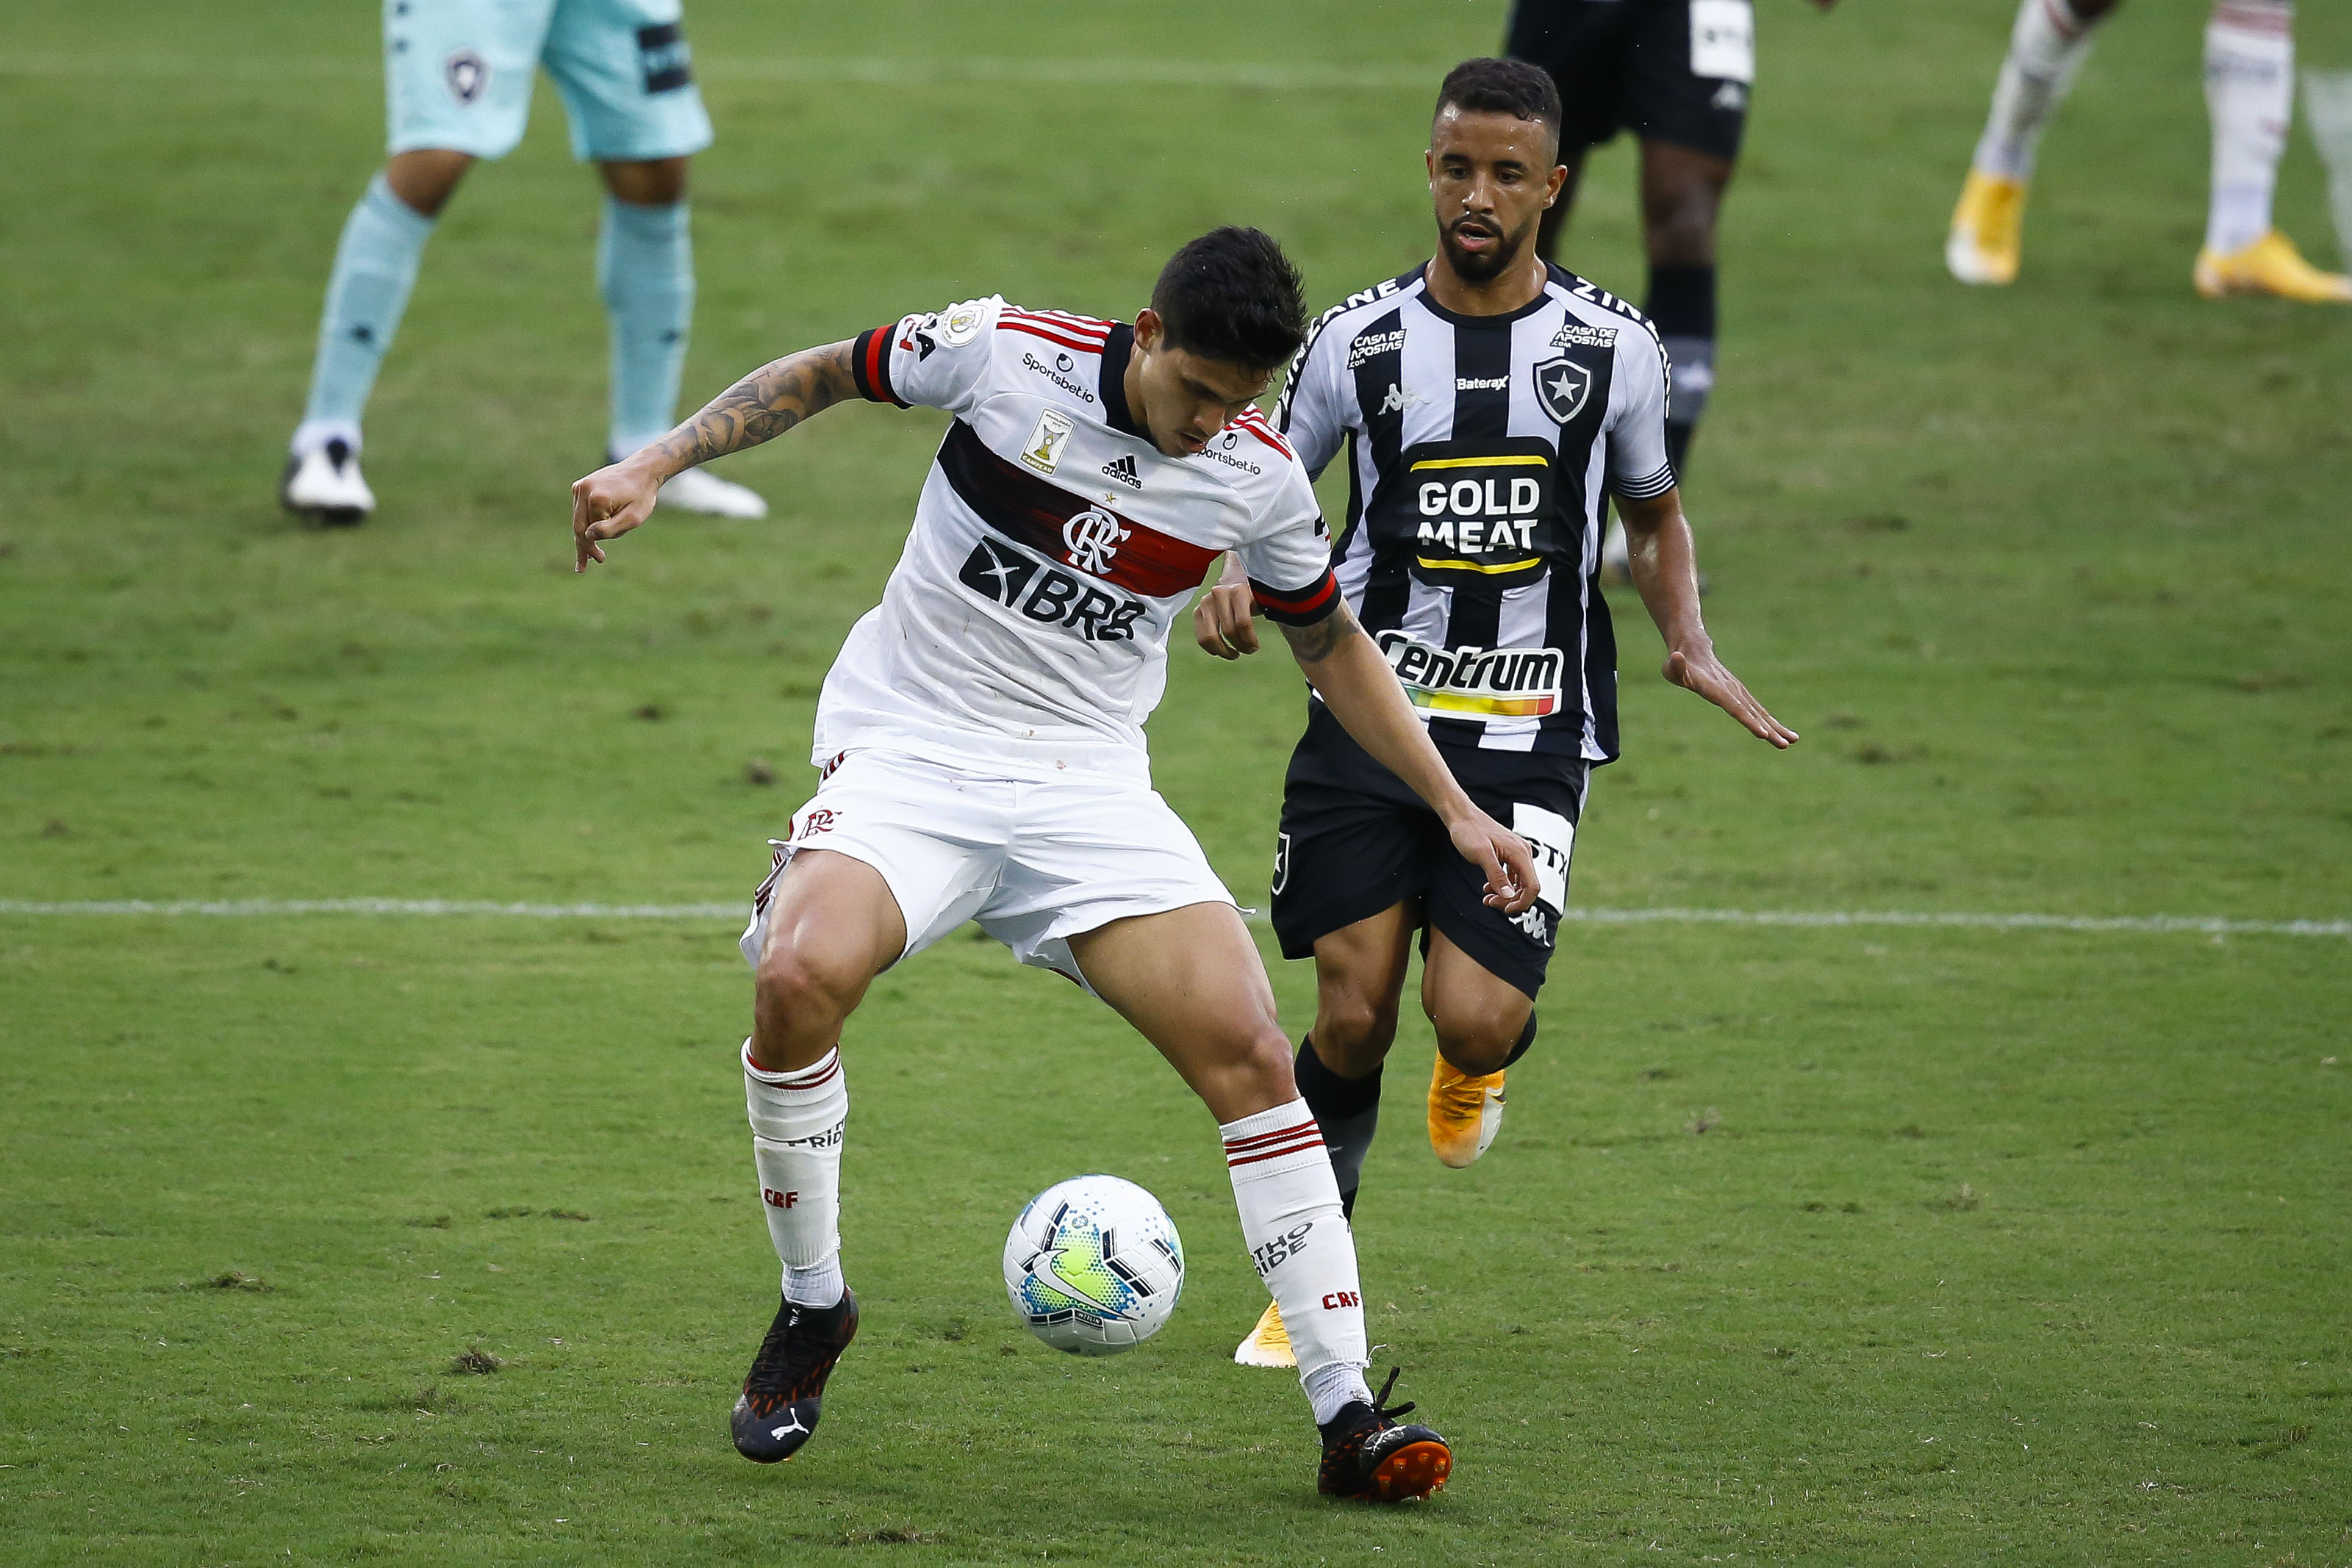 2020 Brasileirao Series A: Botafogo v Flamengo Play Behind Closed Doors Amidst the Coronavirus (COVID - 19) Pandemic